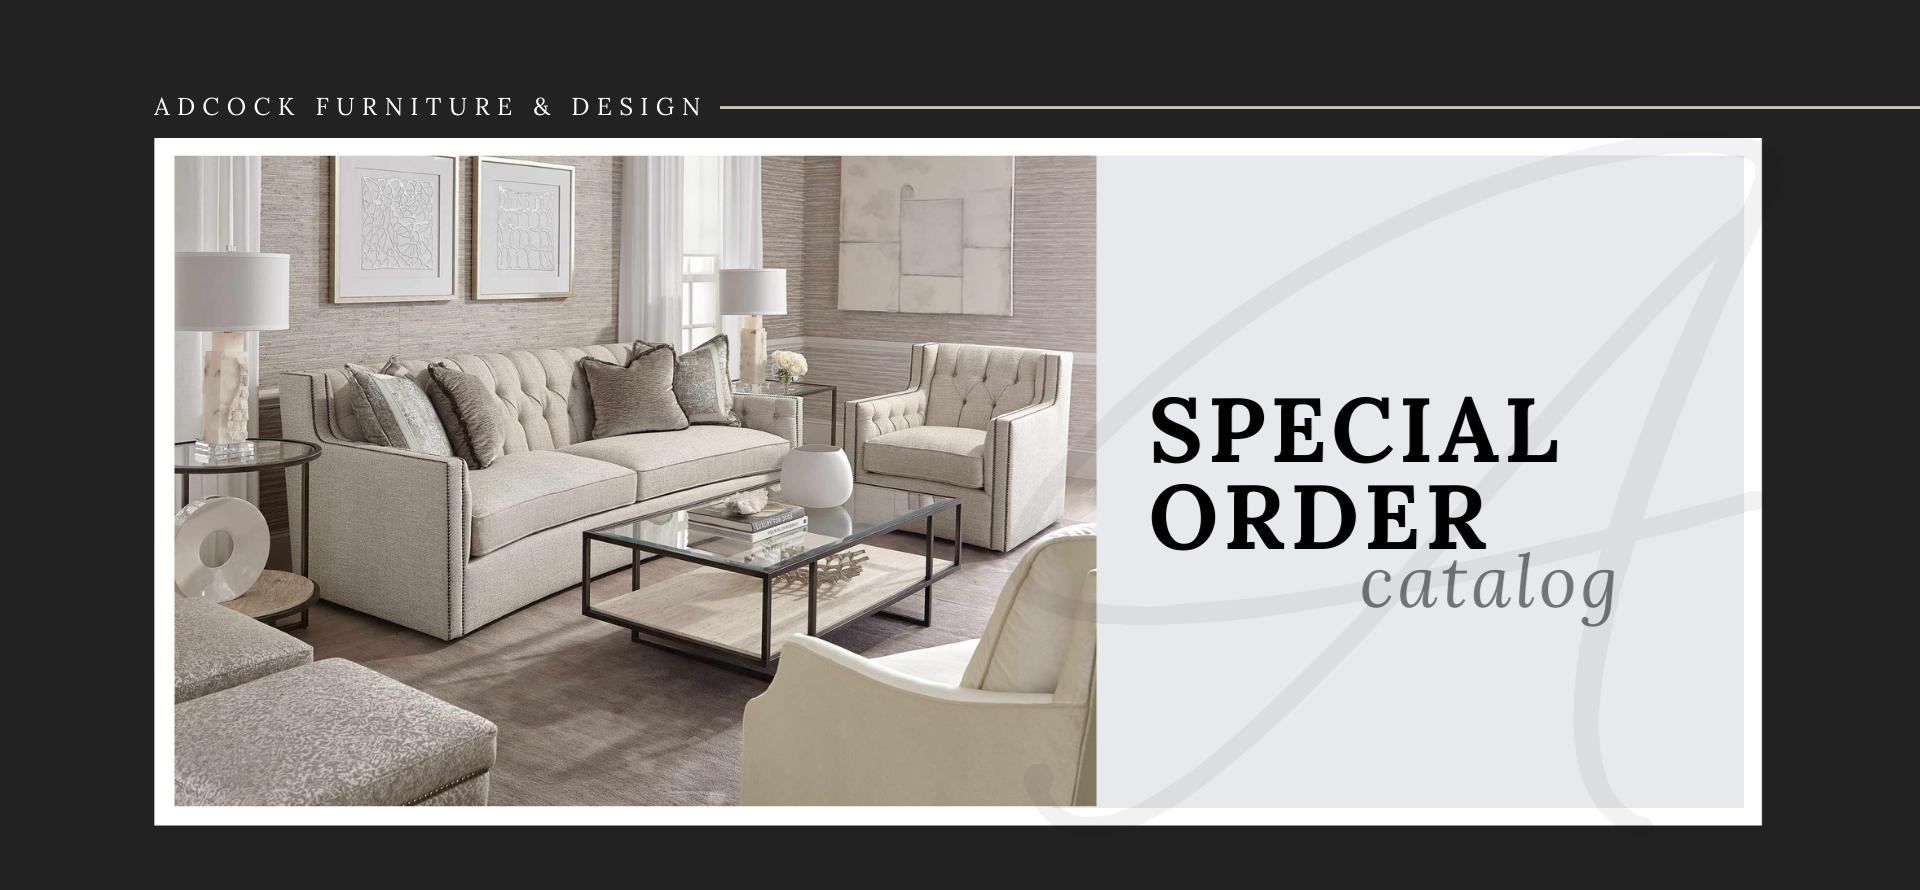 Special Order Catalog